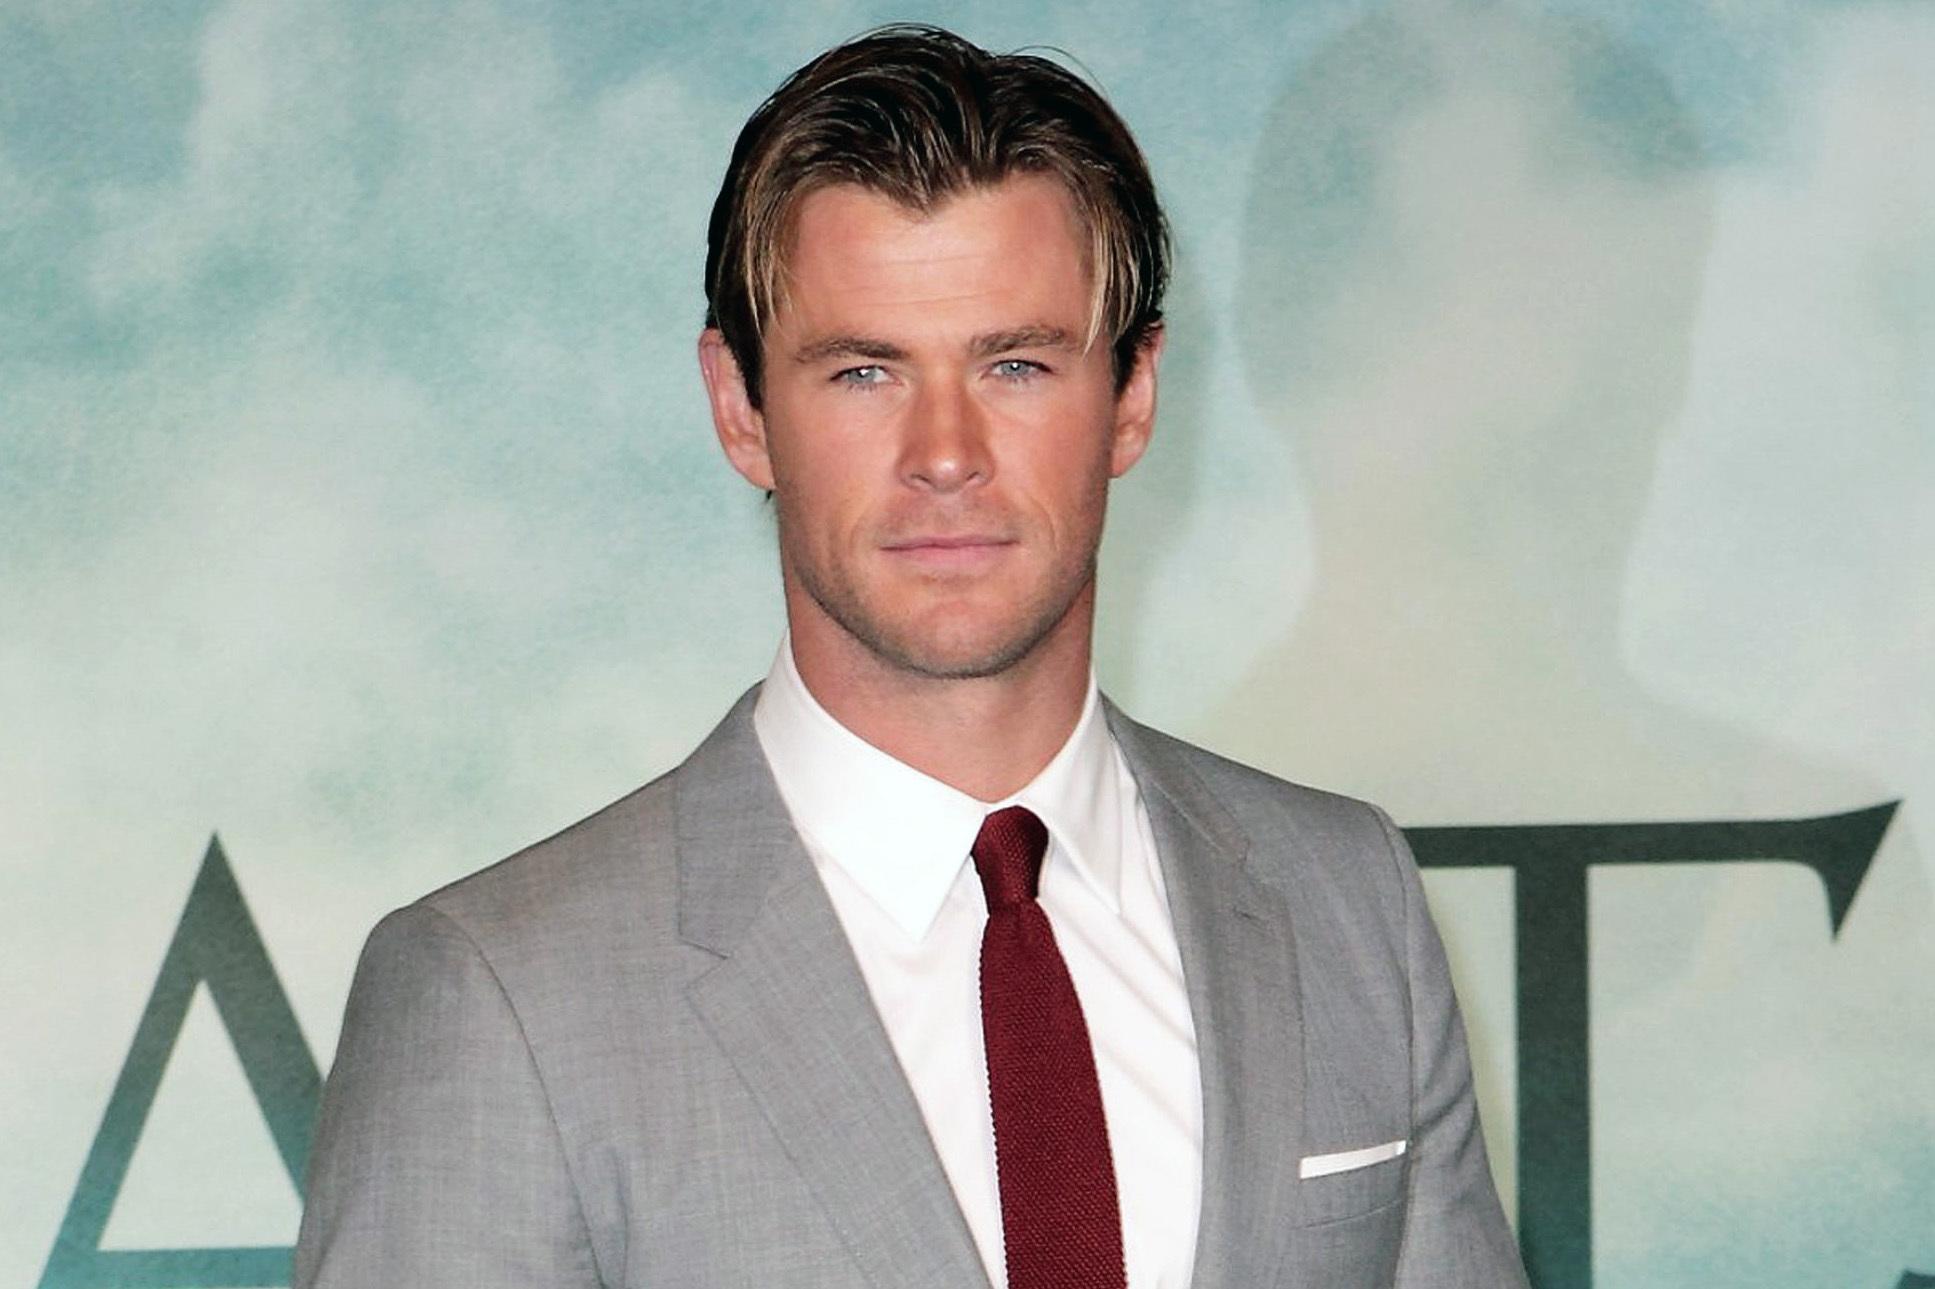 Chris Hemsworth Images